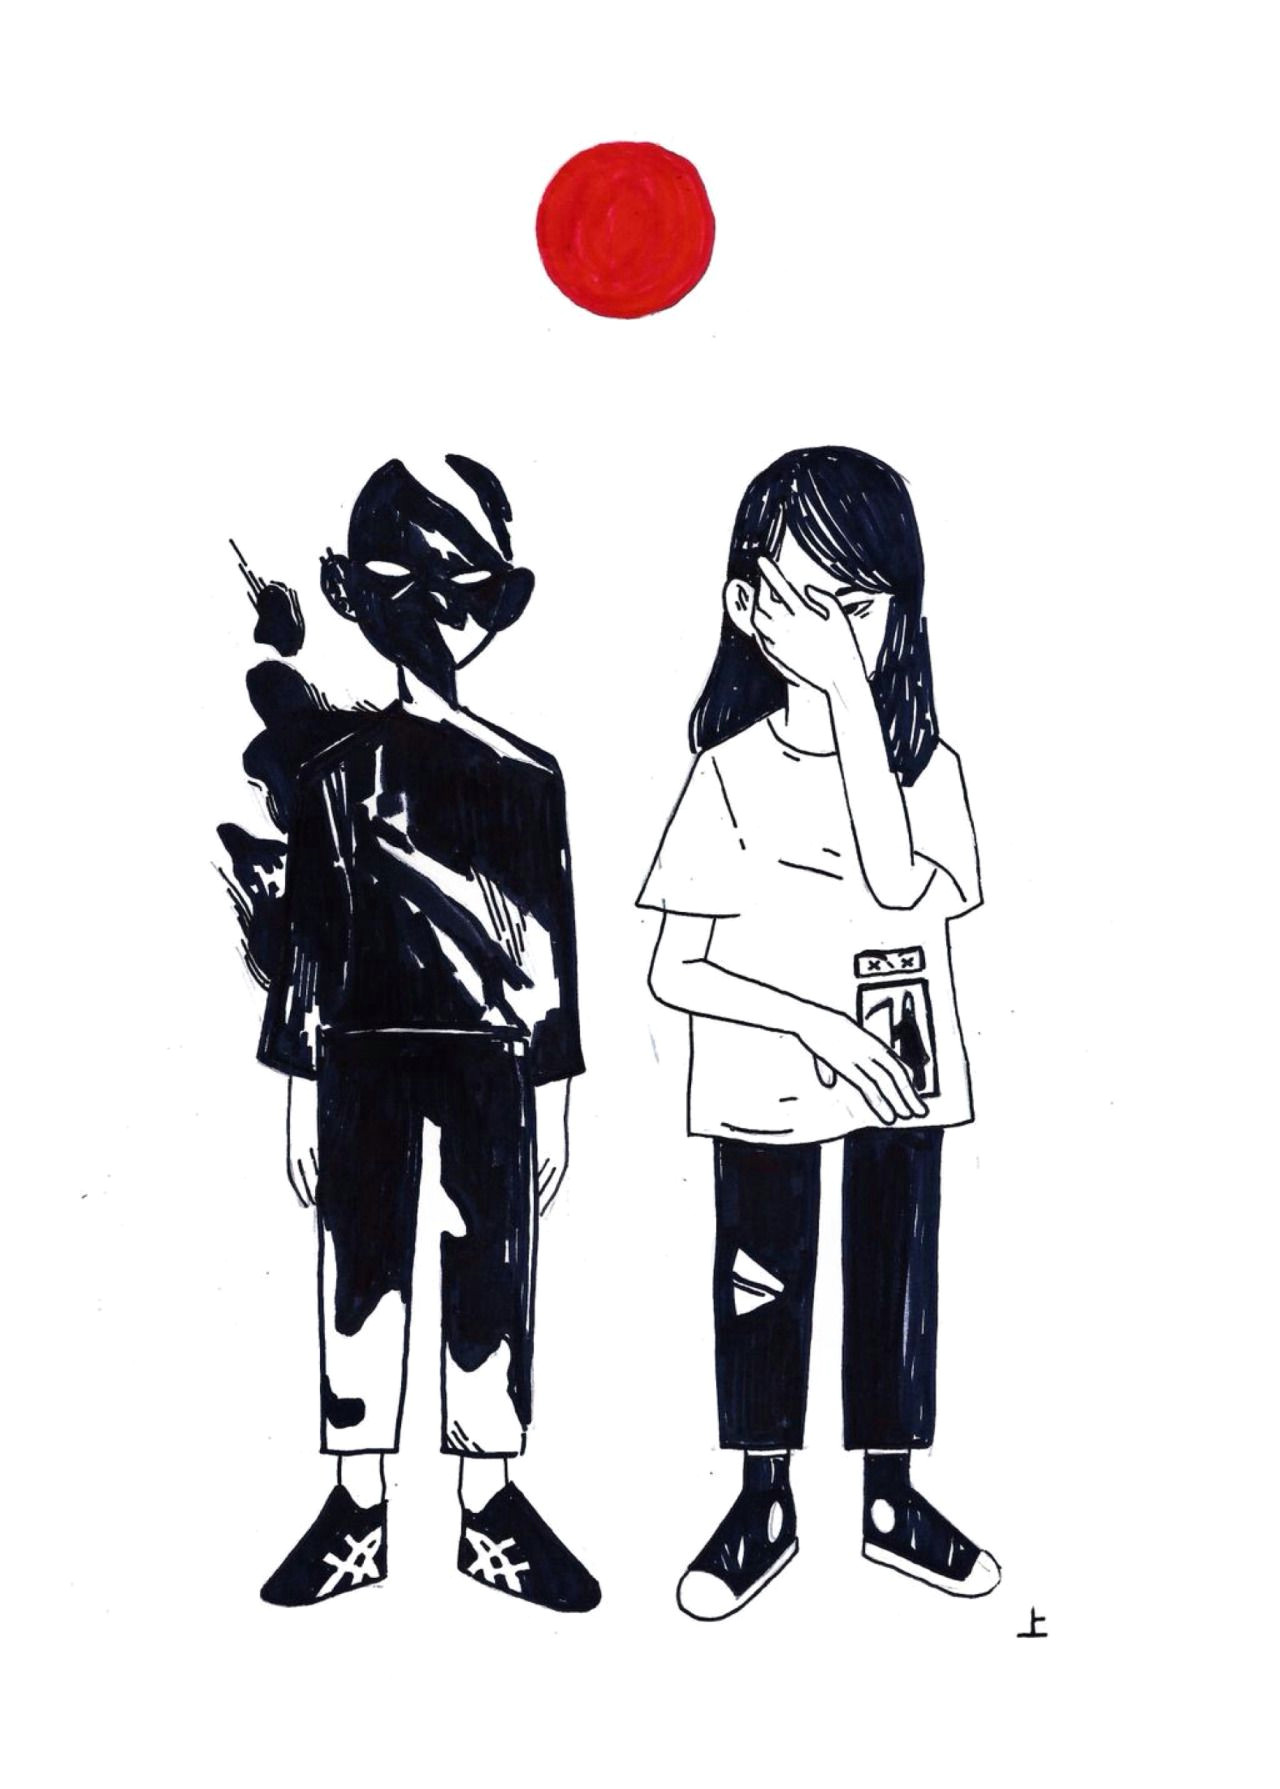 kinorinsama apparition inktober 13 epic drawings cartoon drawings design reference